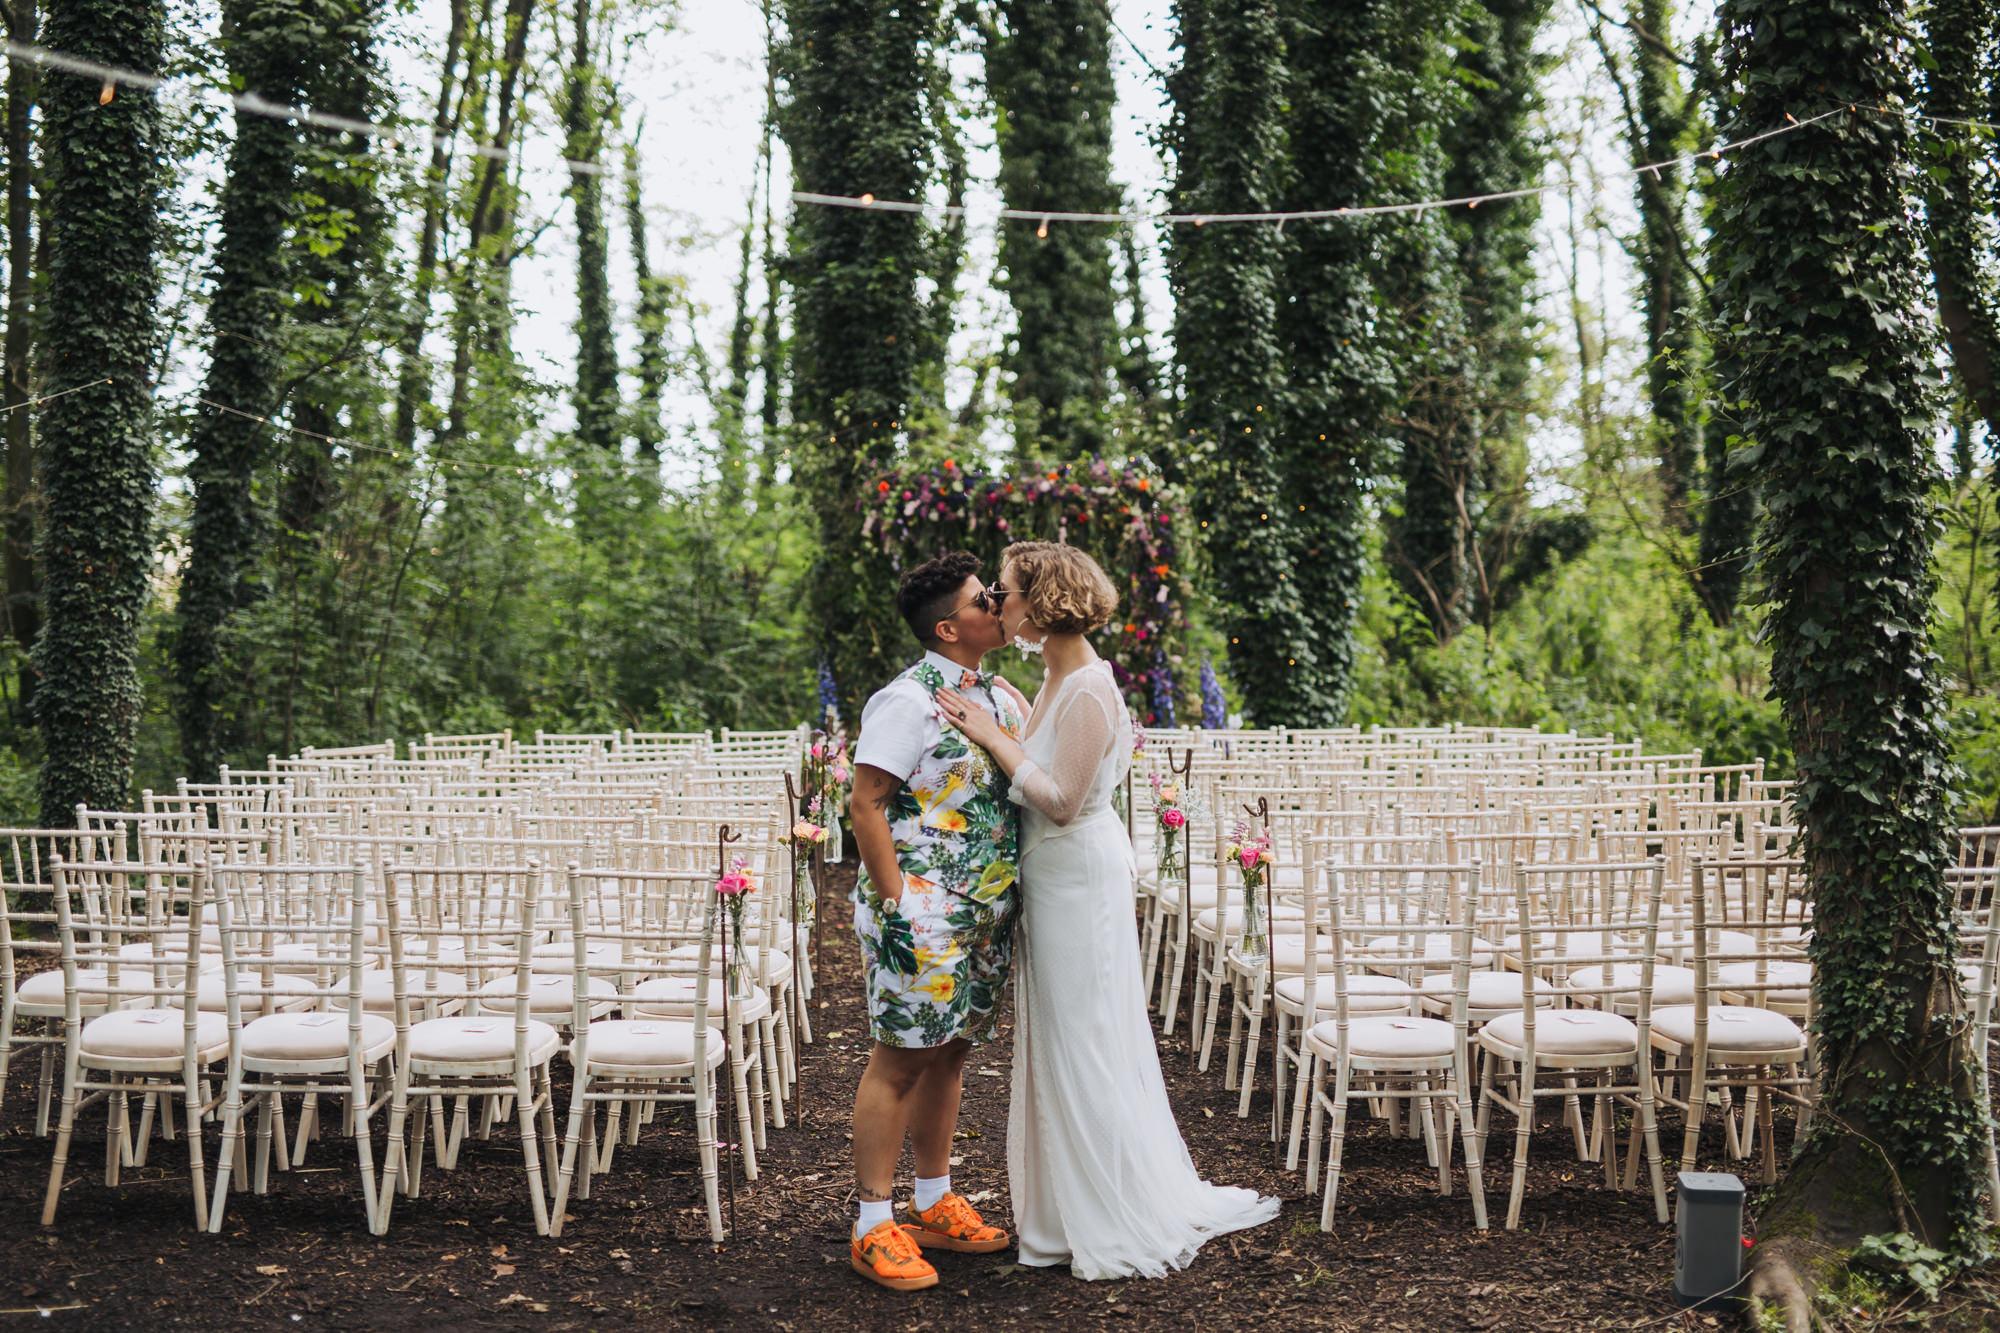 applewood wedding photographer leeds, yorkshire24.jpg